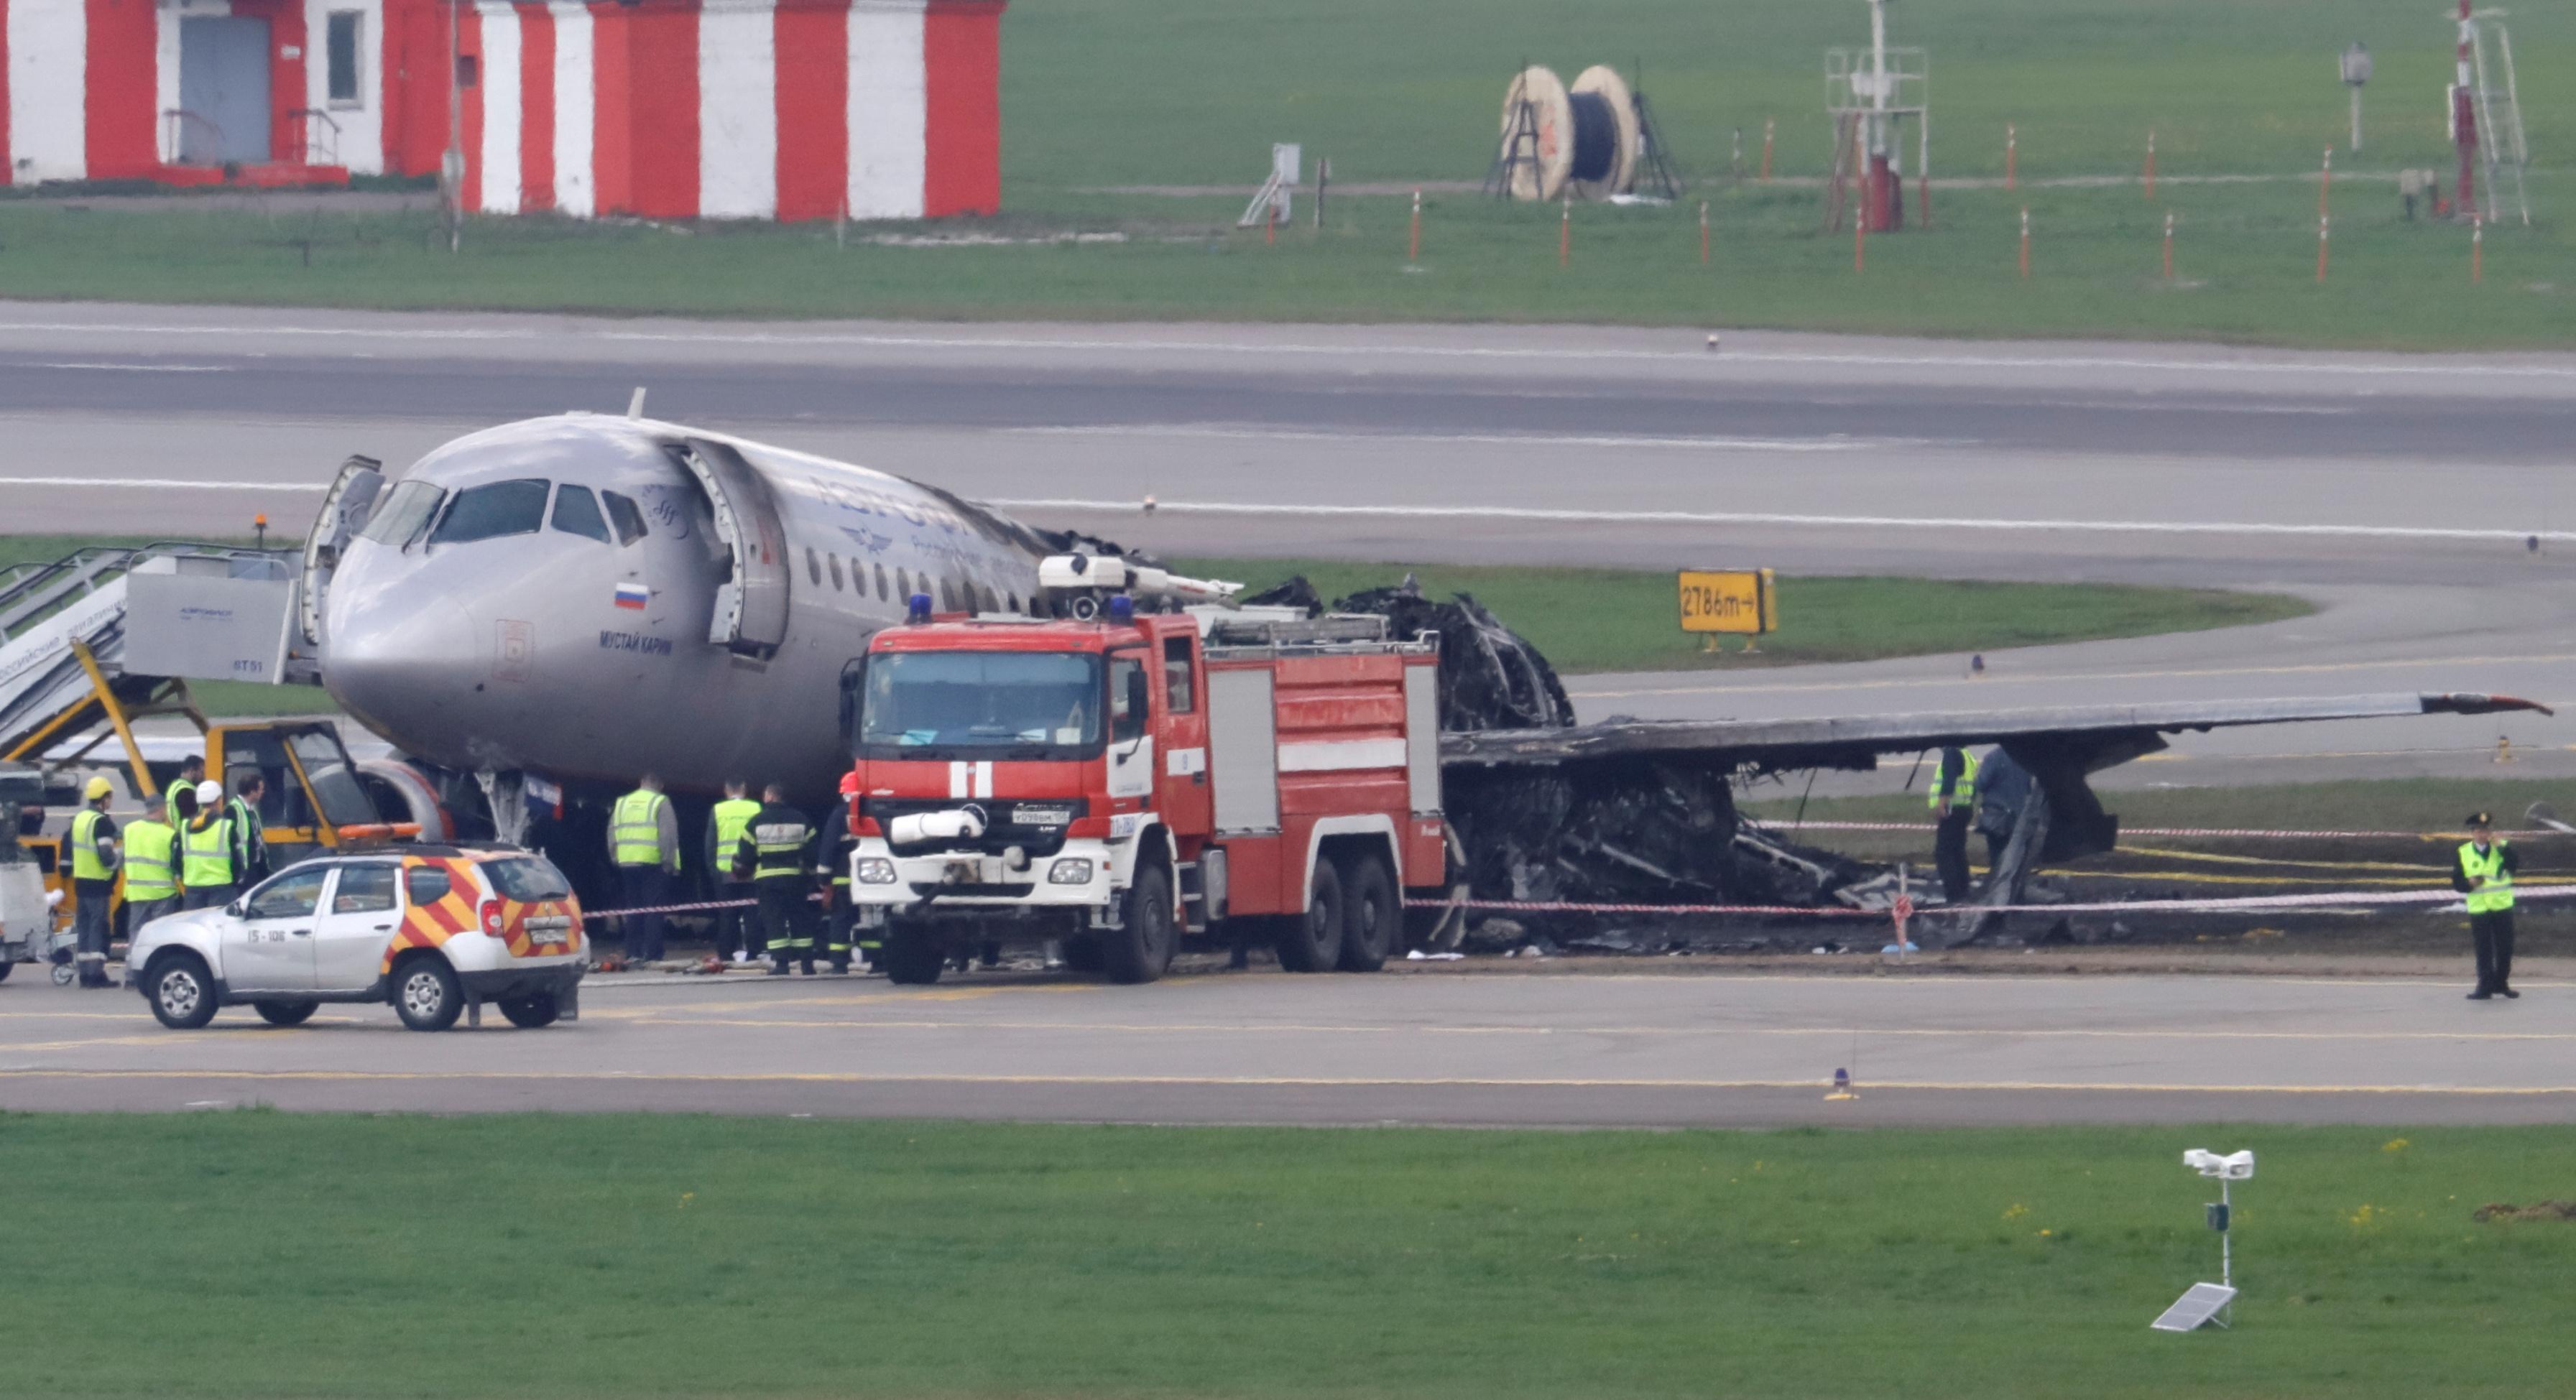 Lightning struck Russian plane before it crashed - investigation